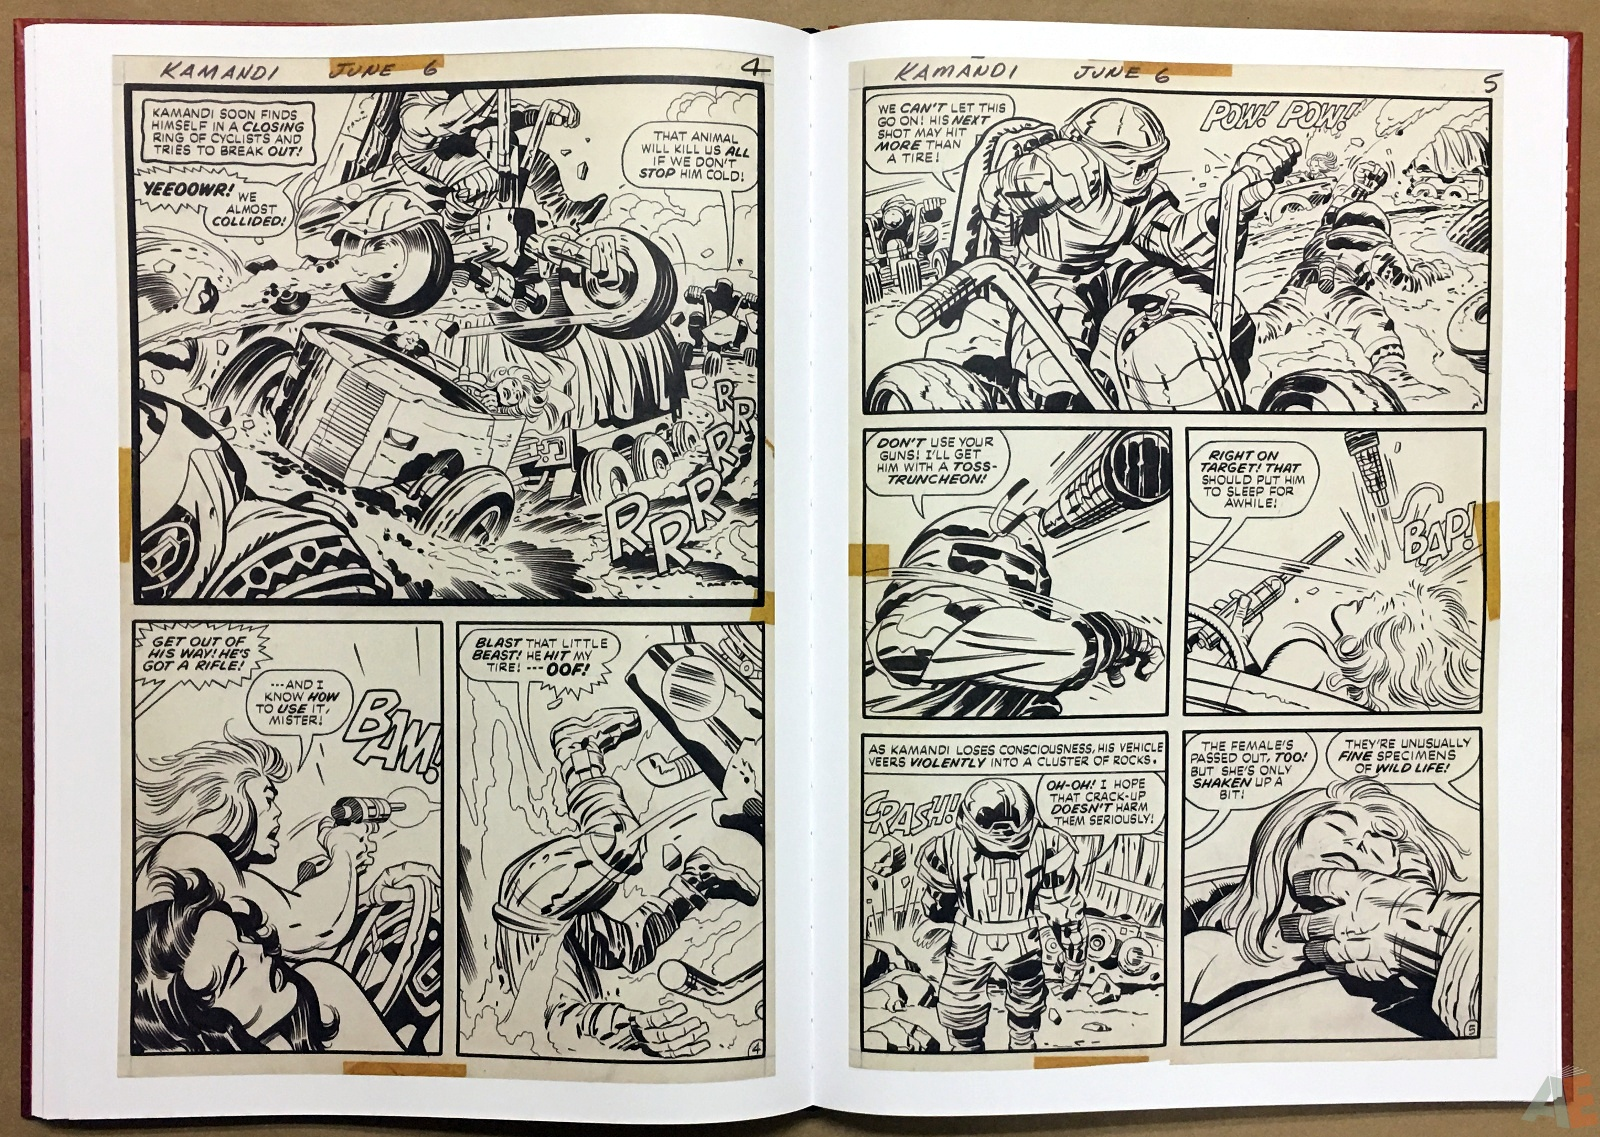 Jack Kirby Kamandi The Last Boy On Earth Artist's Edition 26